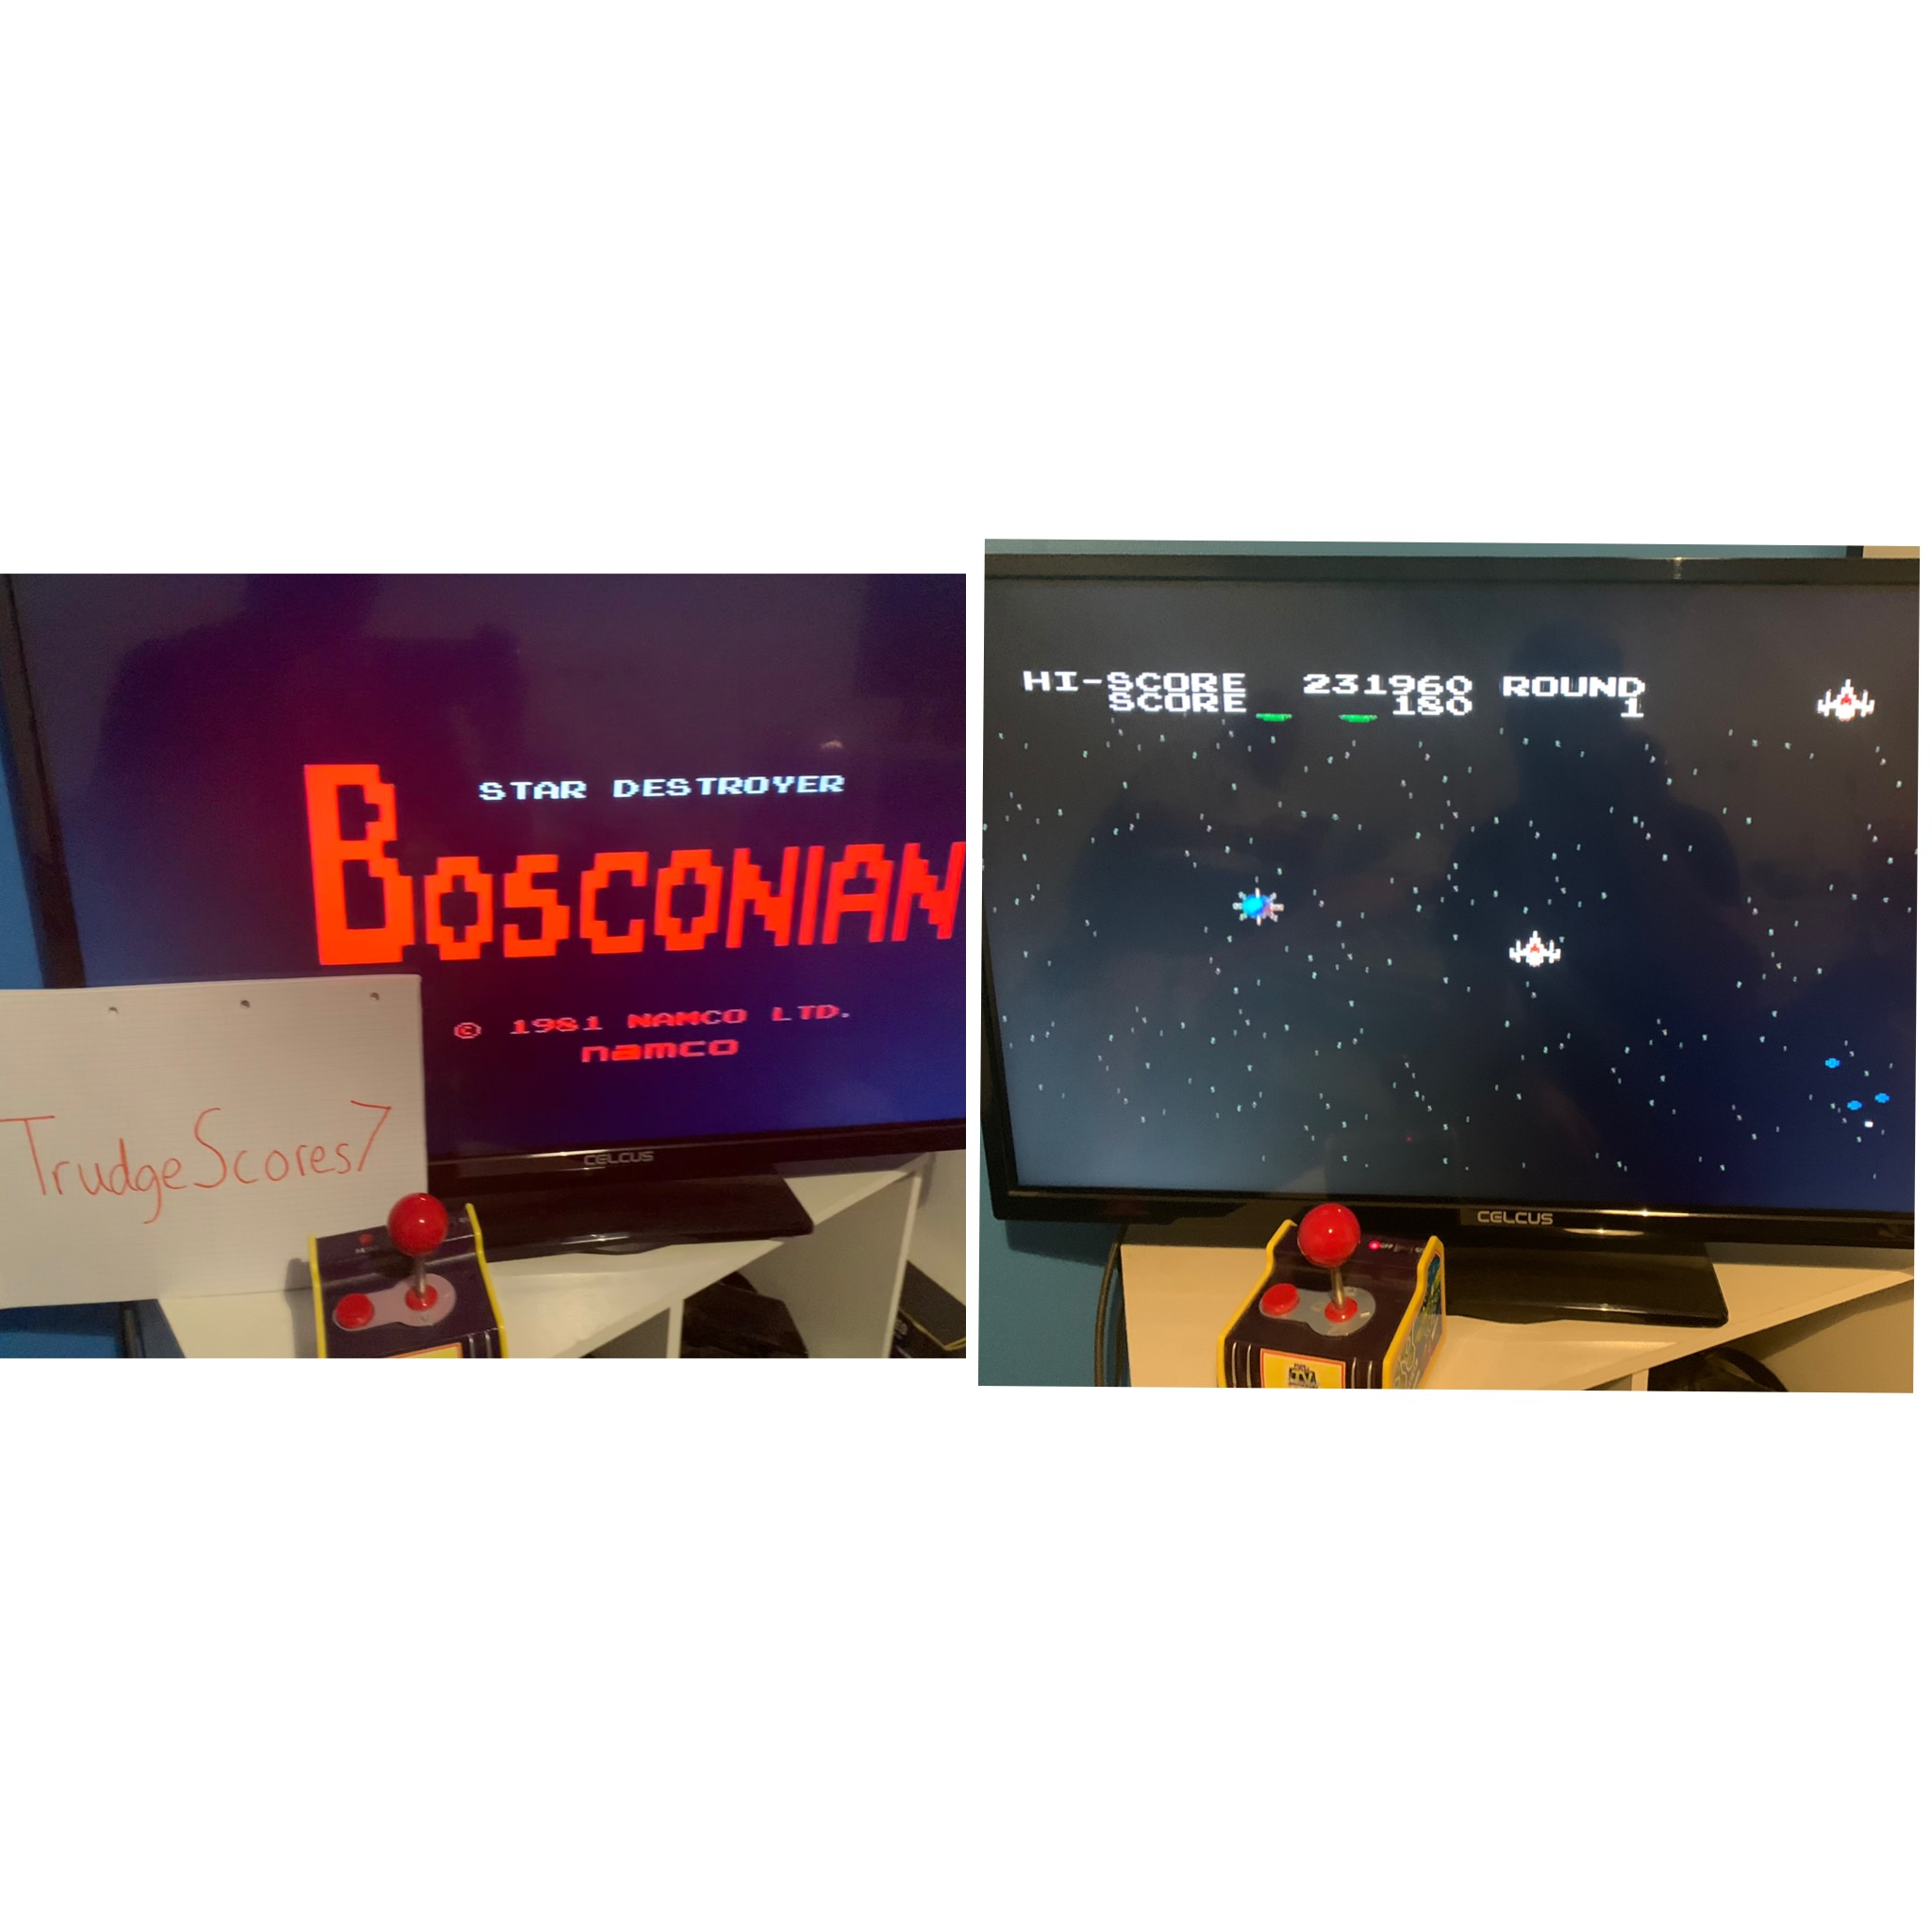 Bosconian 231,960 points